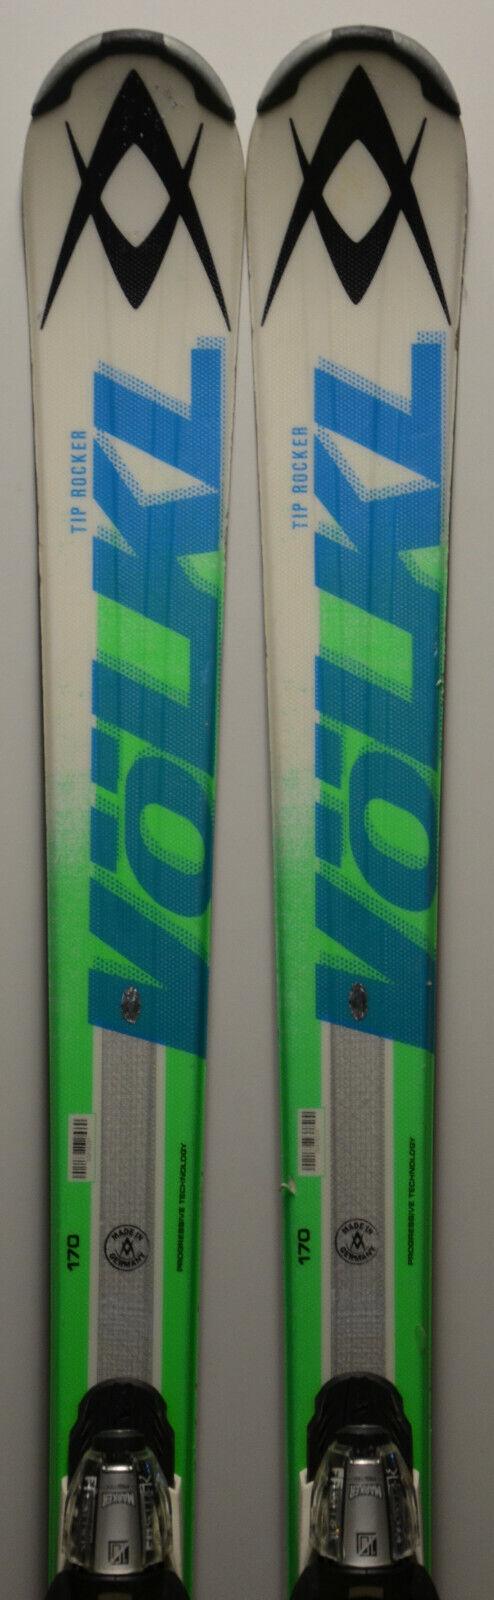 Ski parabolisch gebraucht Völkl RTM - 170cm   177cm